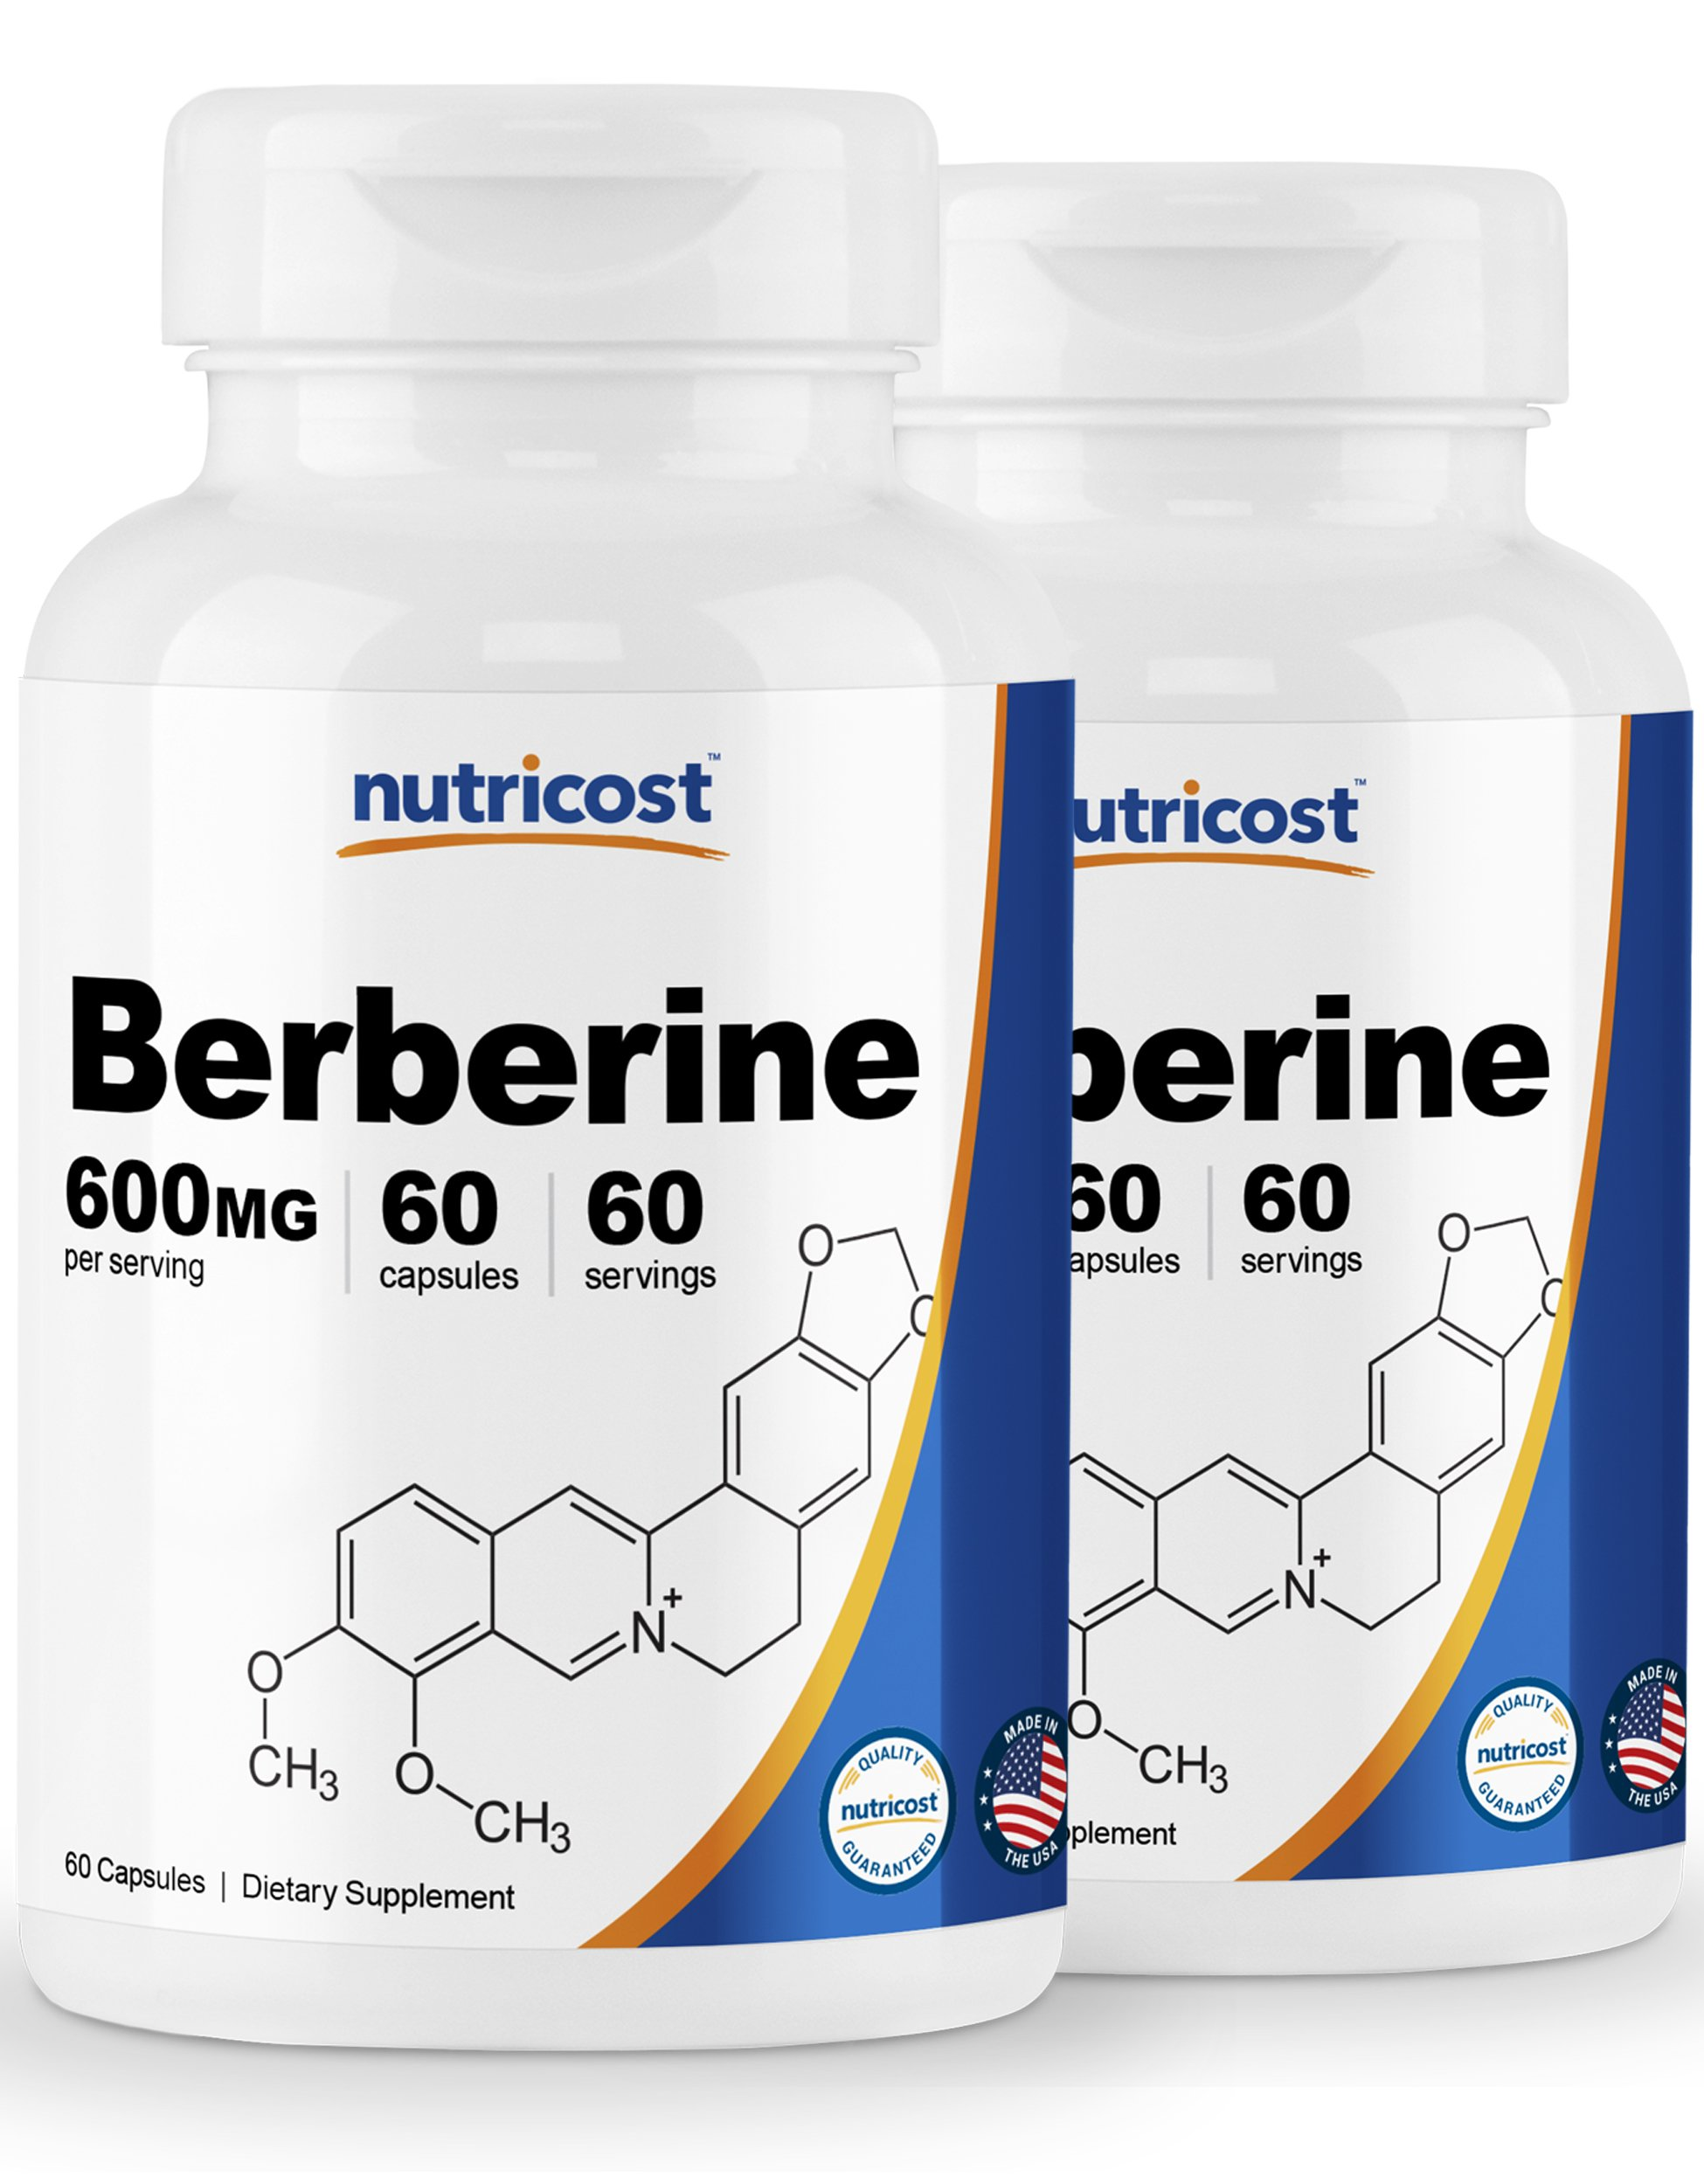 Nutricost Berberine HCl 600mg, 60 Caps (2 Bottles) - Gluten Free, Veggie Caps, Non-GMO